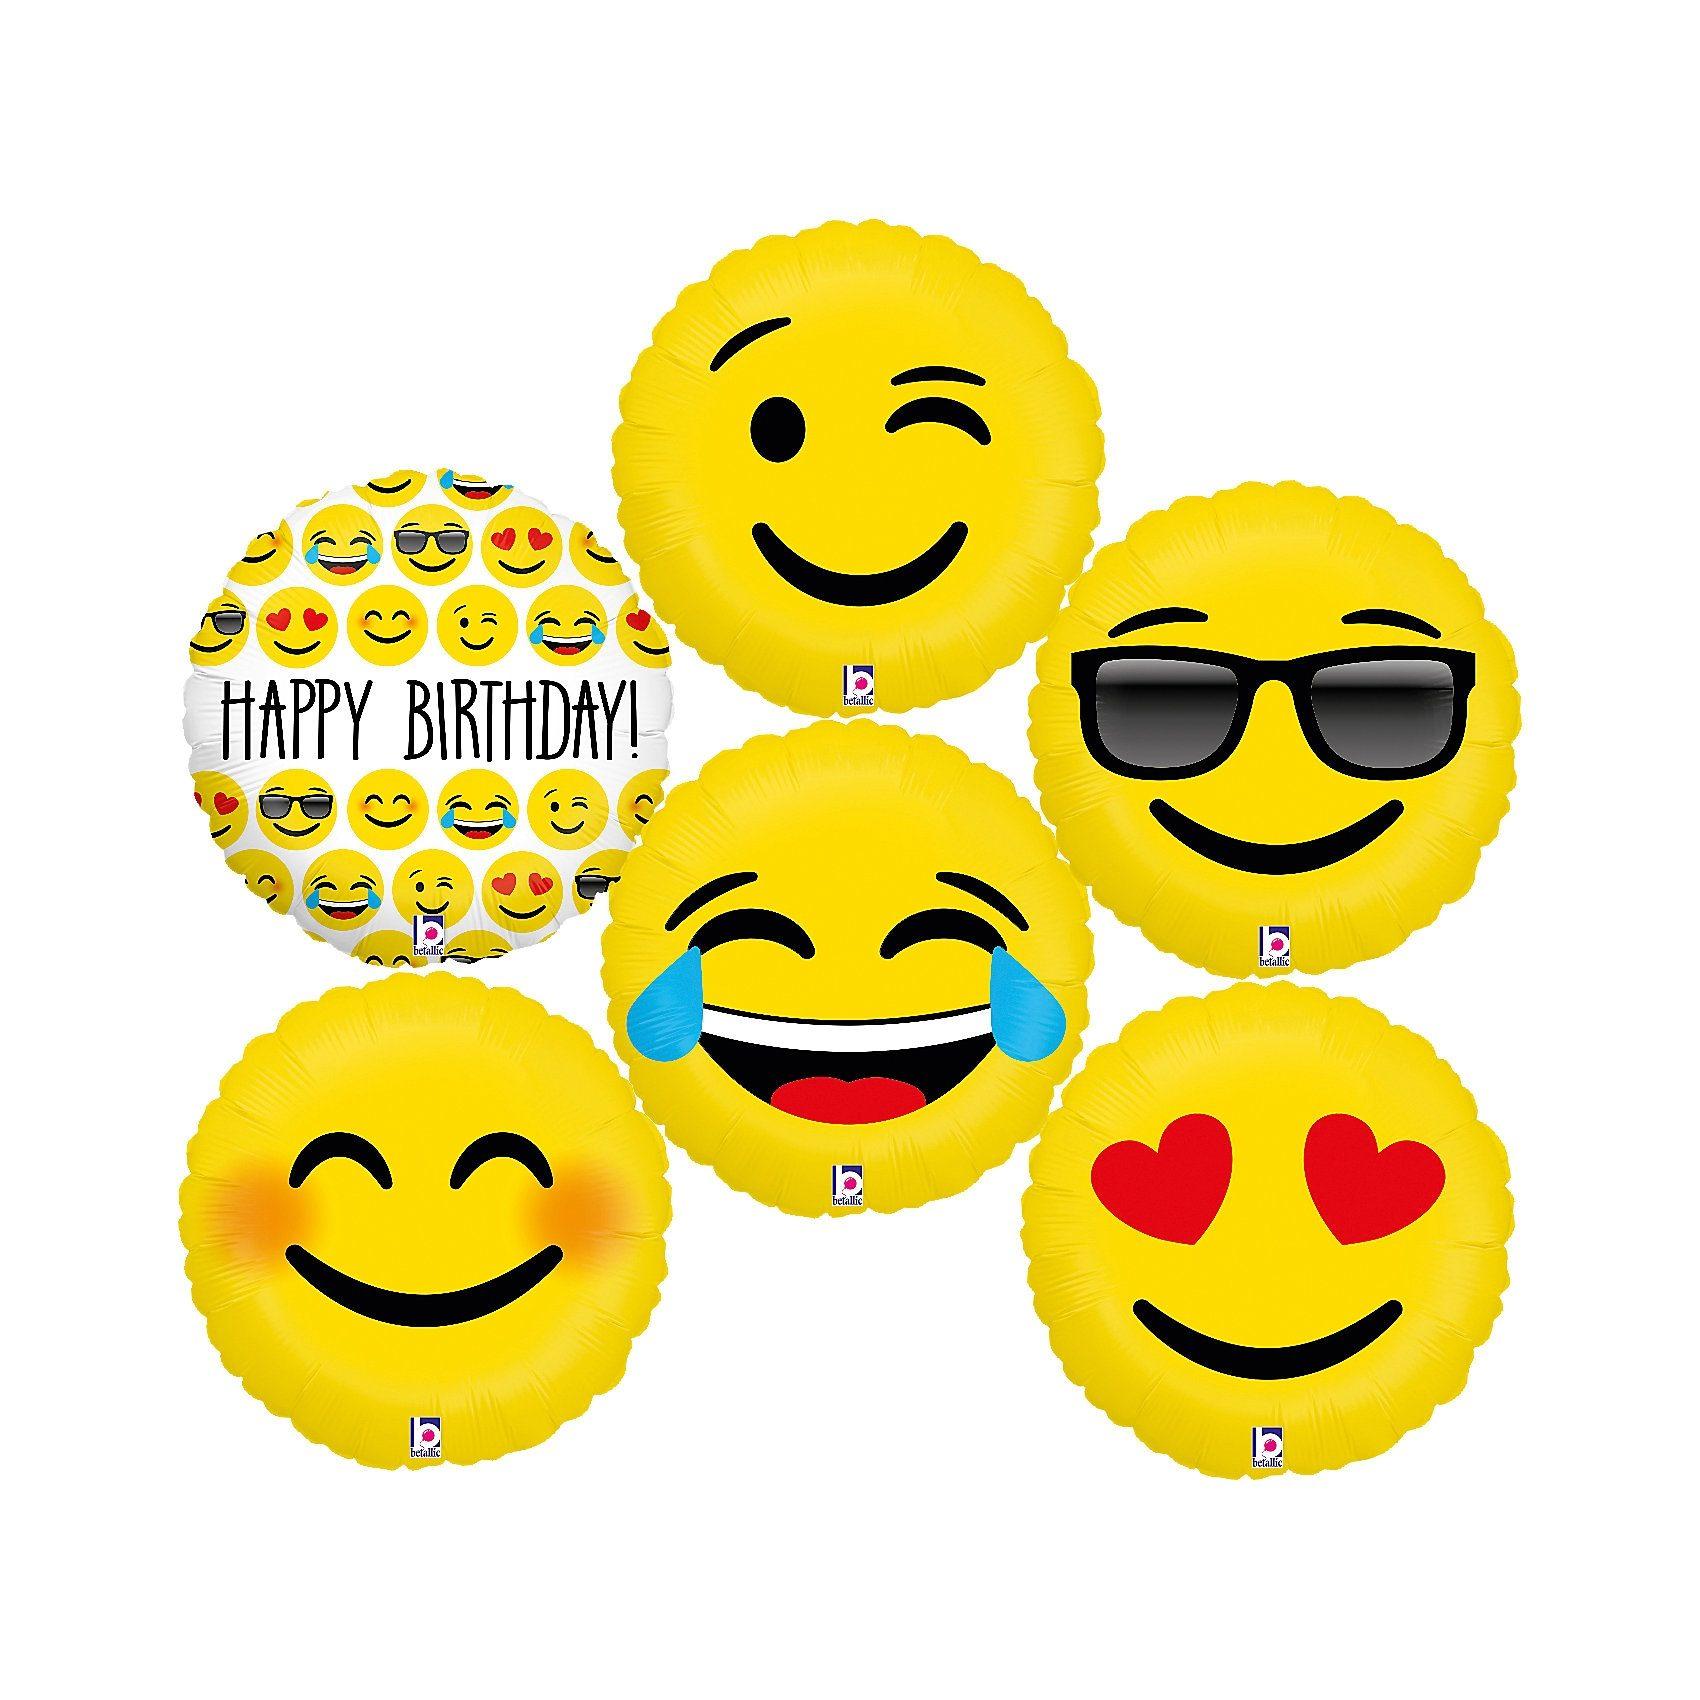 Karaloon Folienballon-Set Emojis 46 cm, 6 Stück